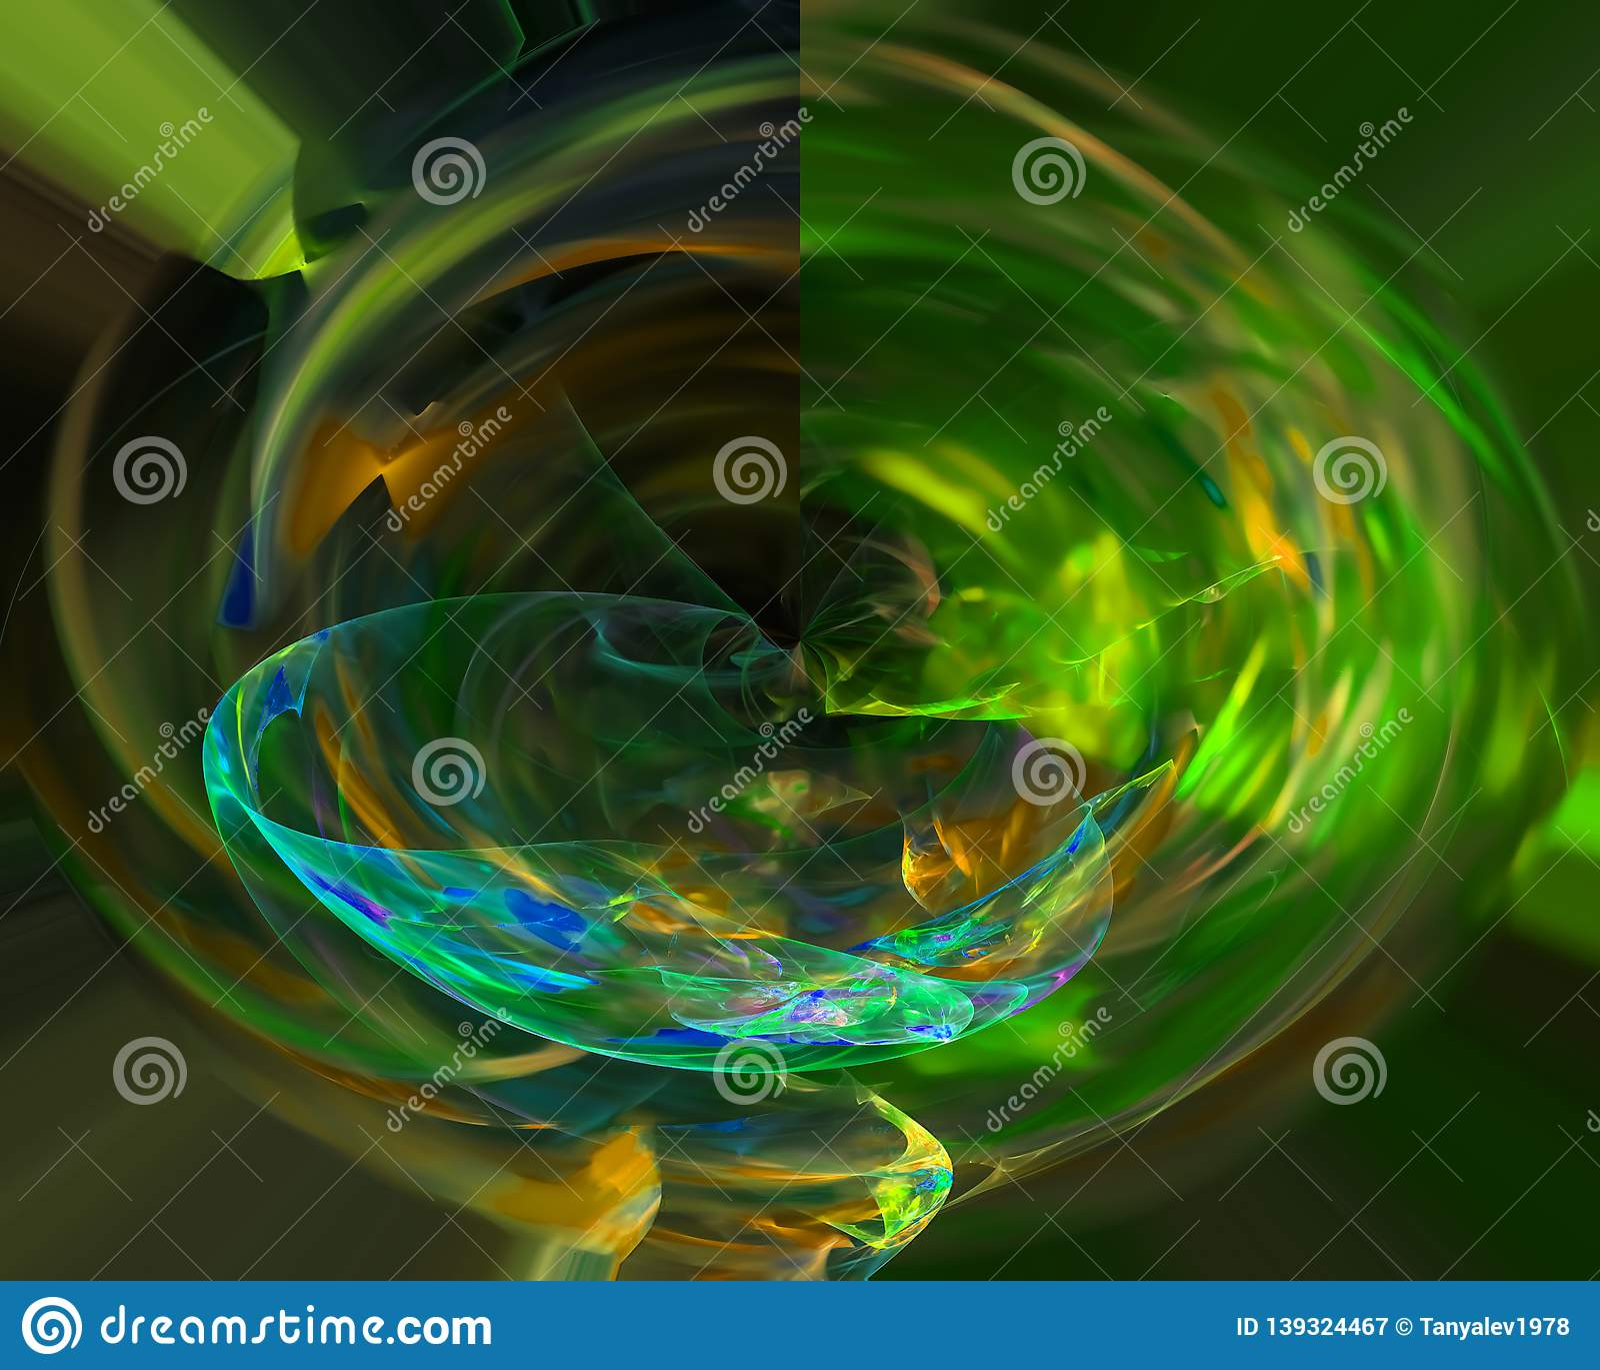 Digital abstract fractal curve overlay shape decoration dynamic energy